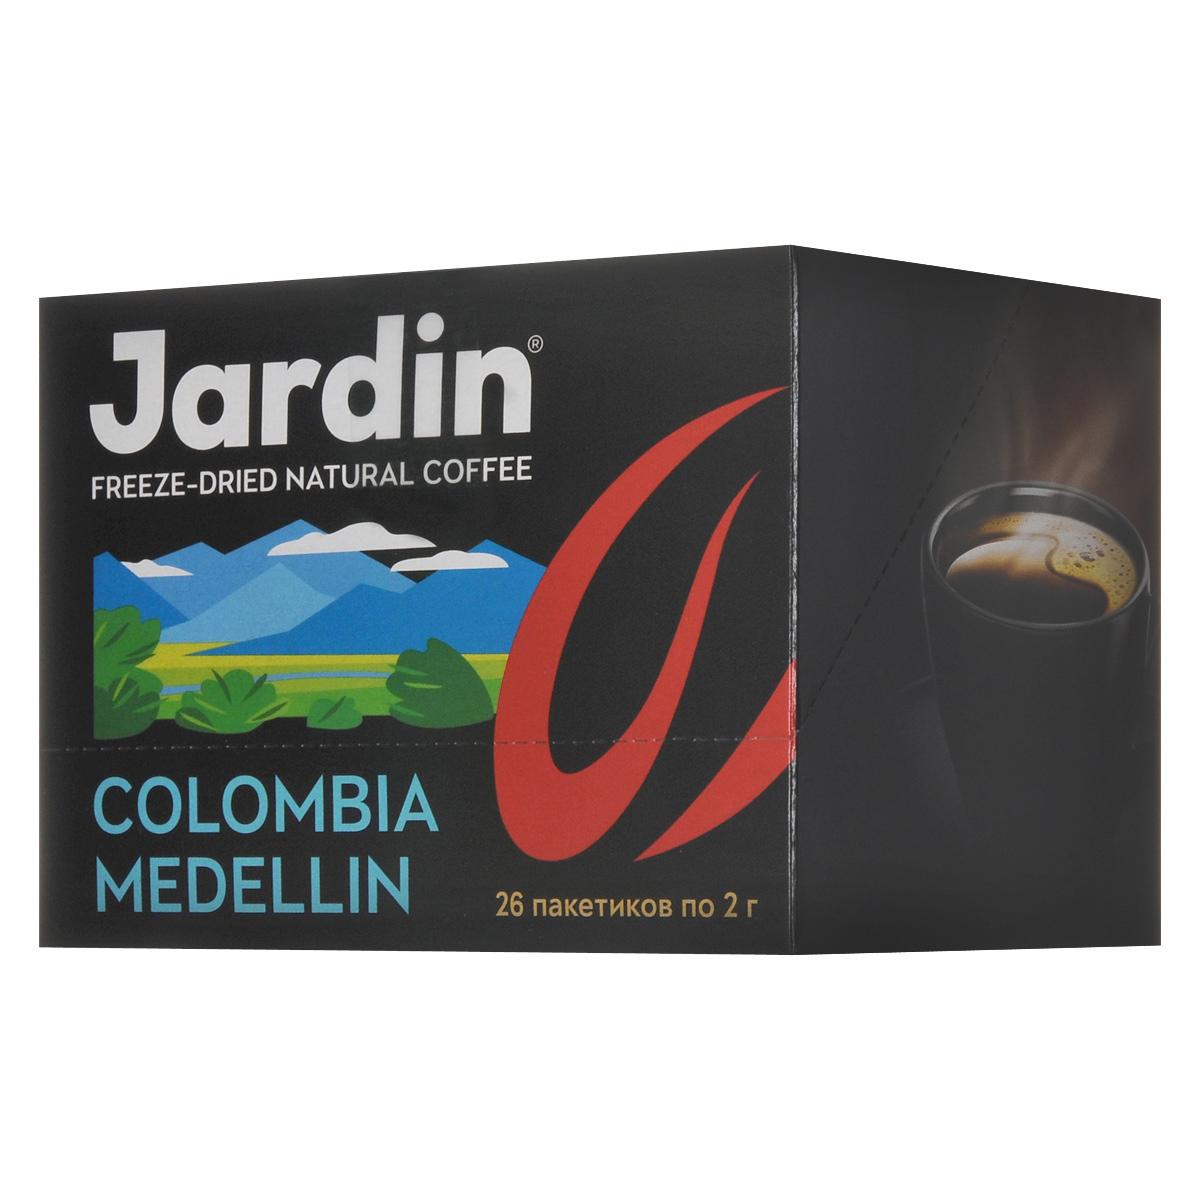 Jardin Colombia Medellin растворимый кофе в пакетиках, 26 шт